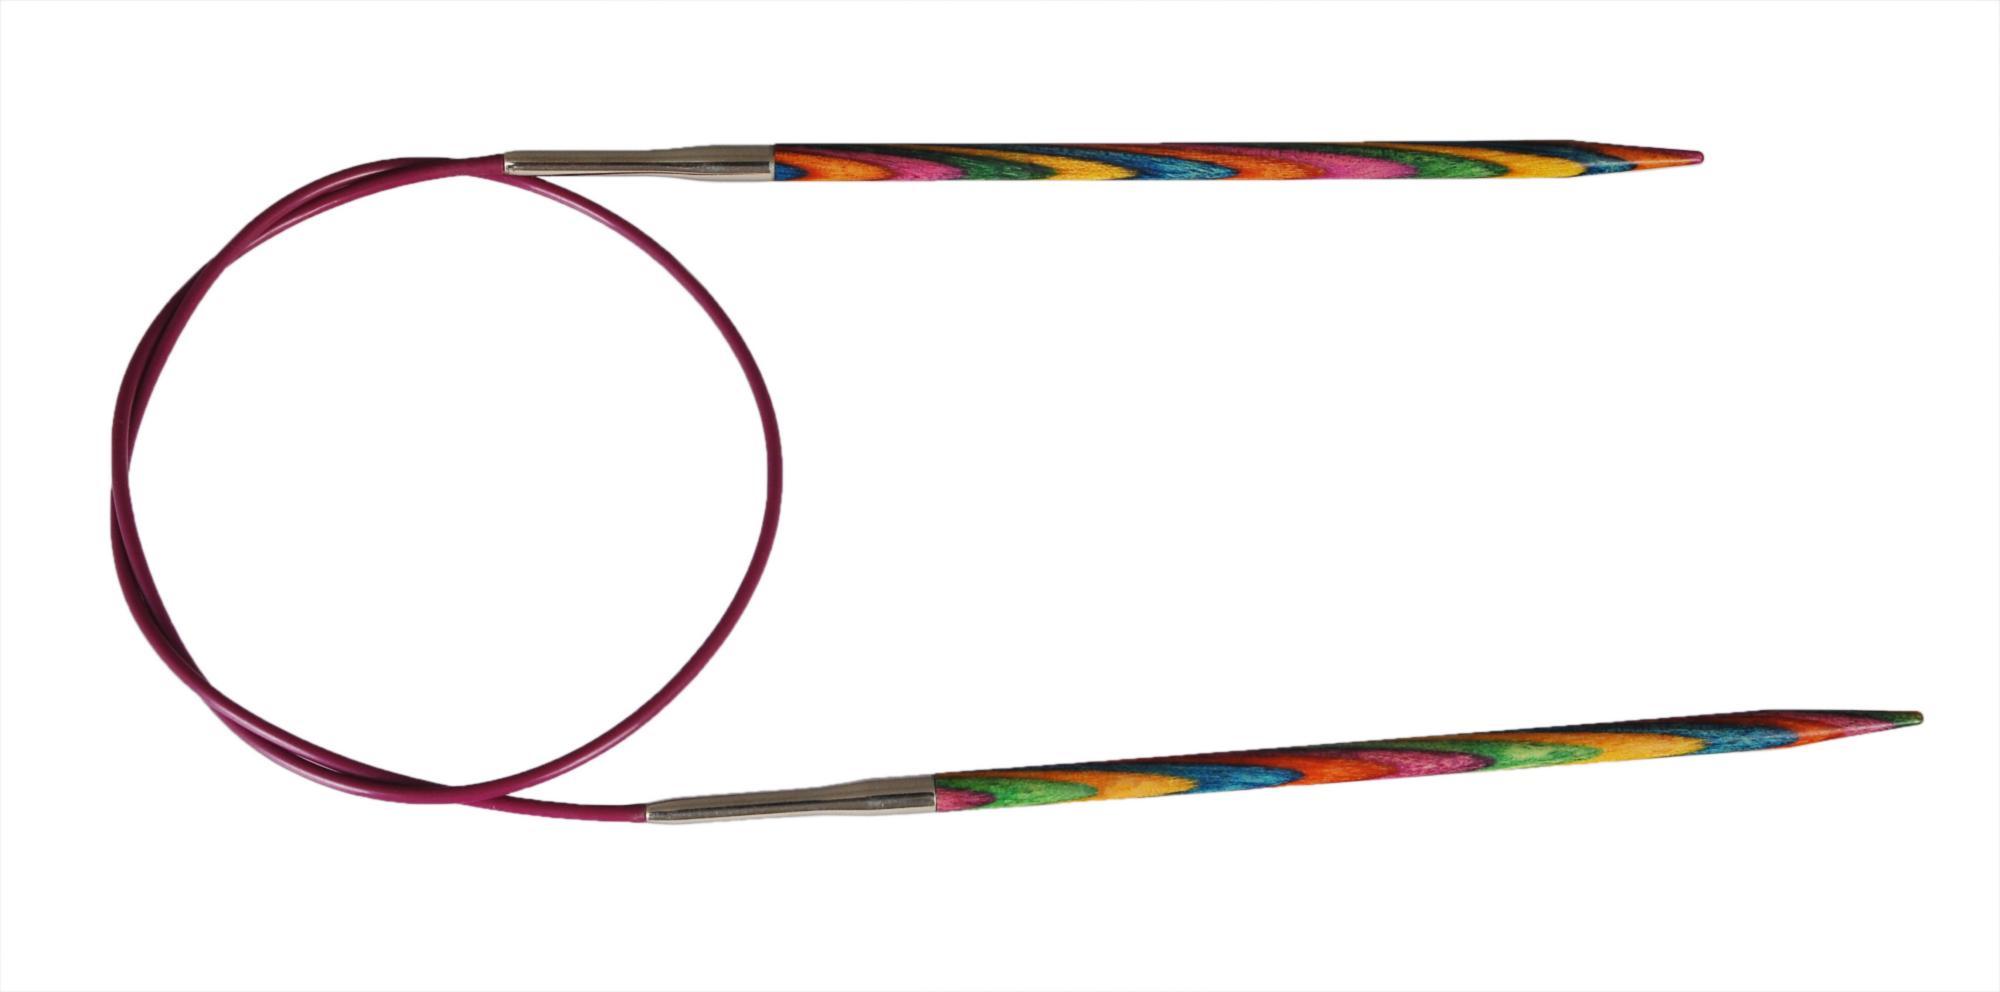 Спицы круговые 150 см Symfonie Wood KnitPro, 21387, 6.50 мм